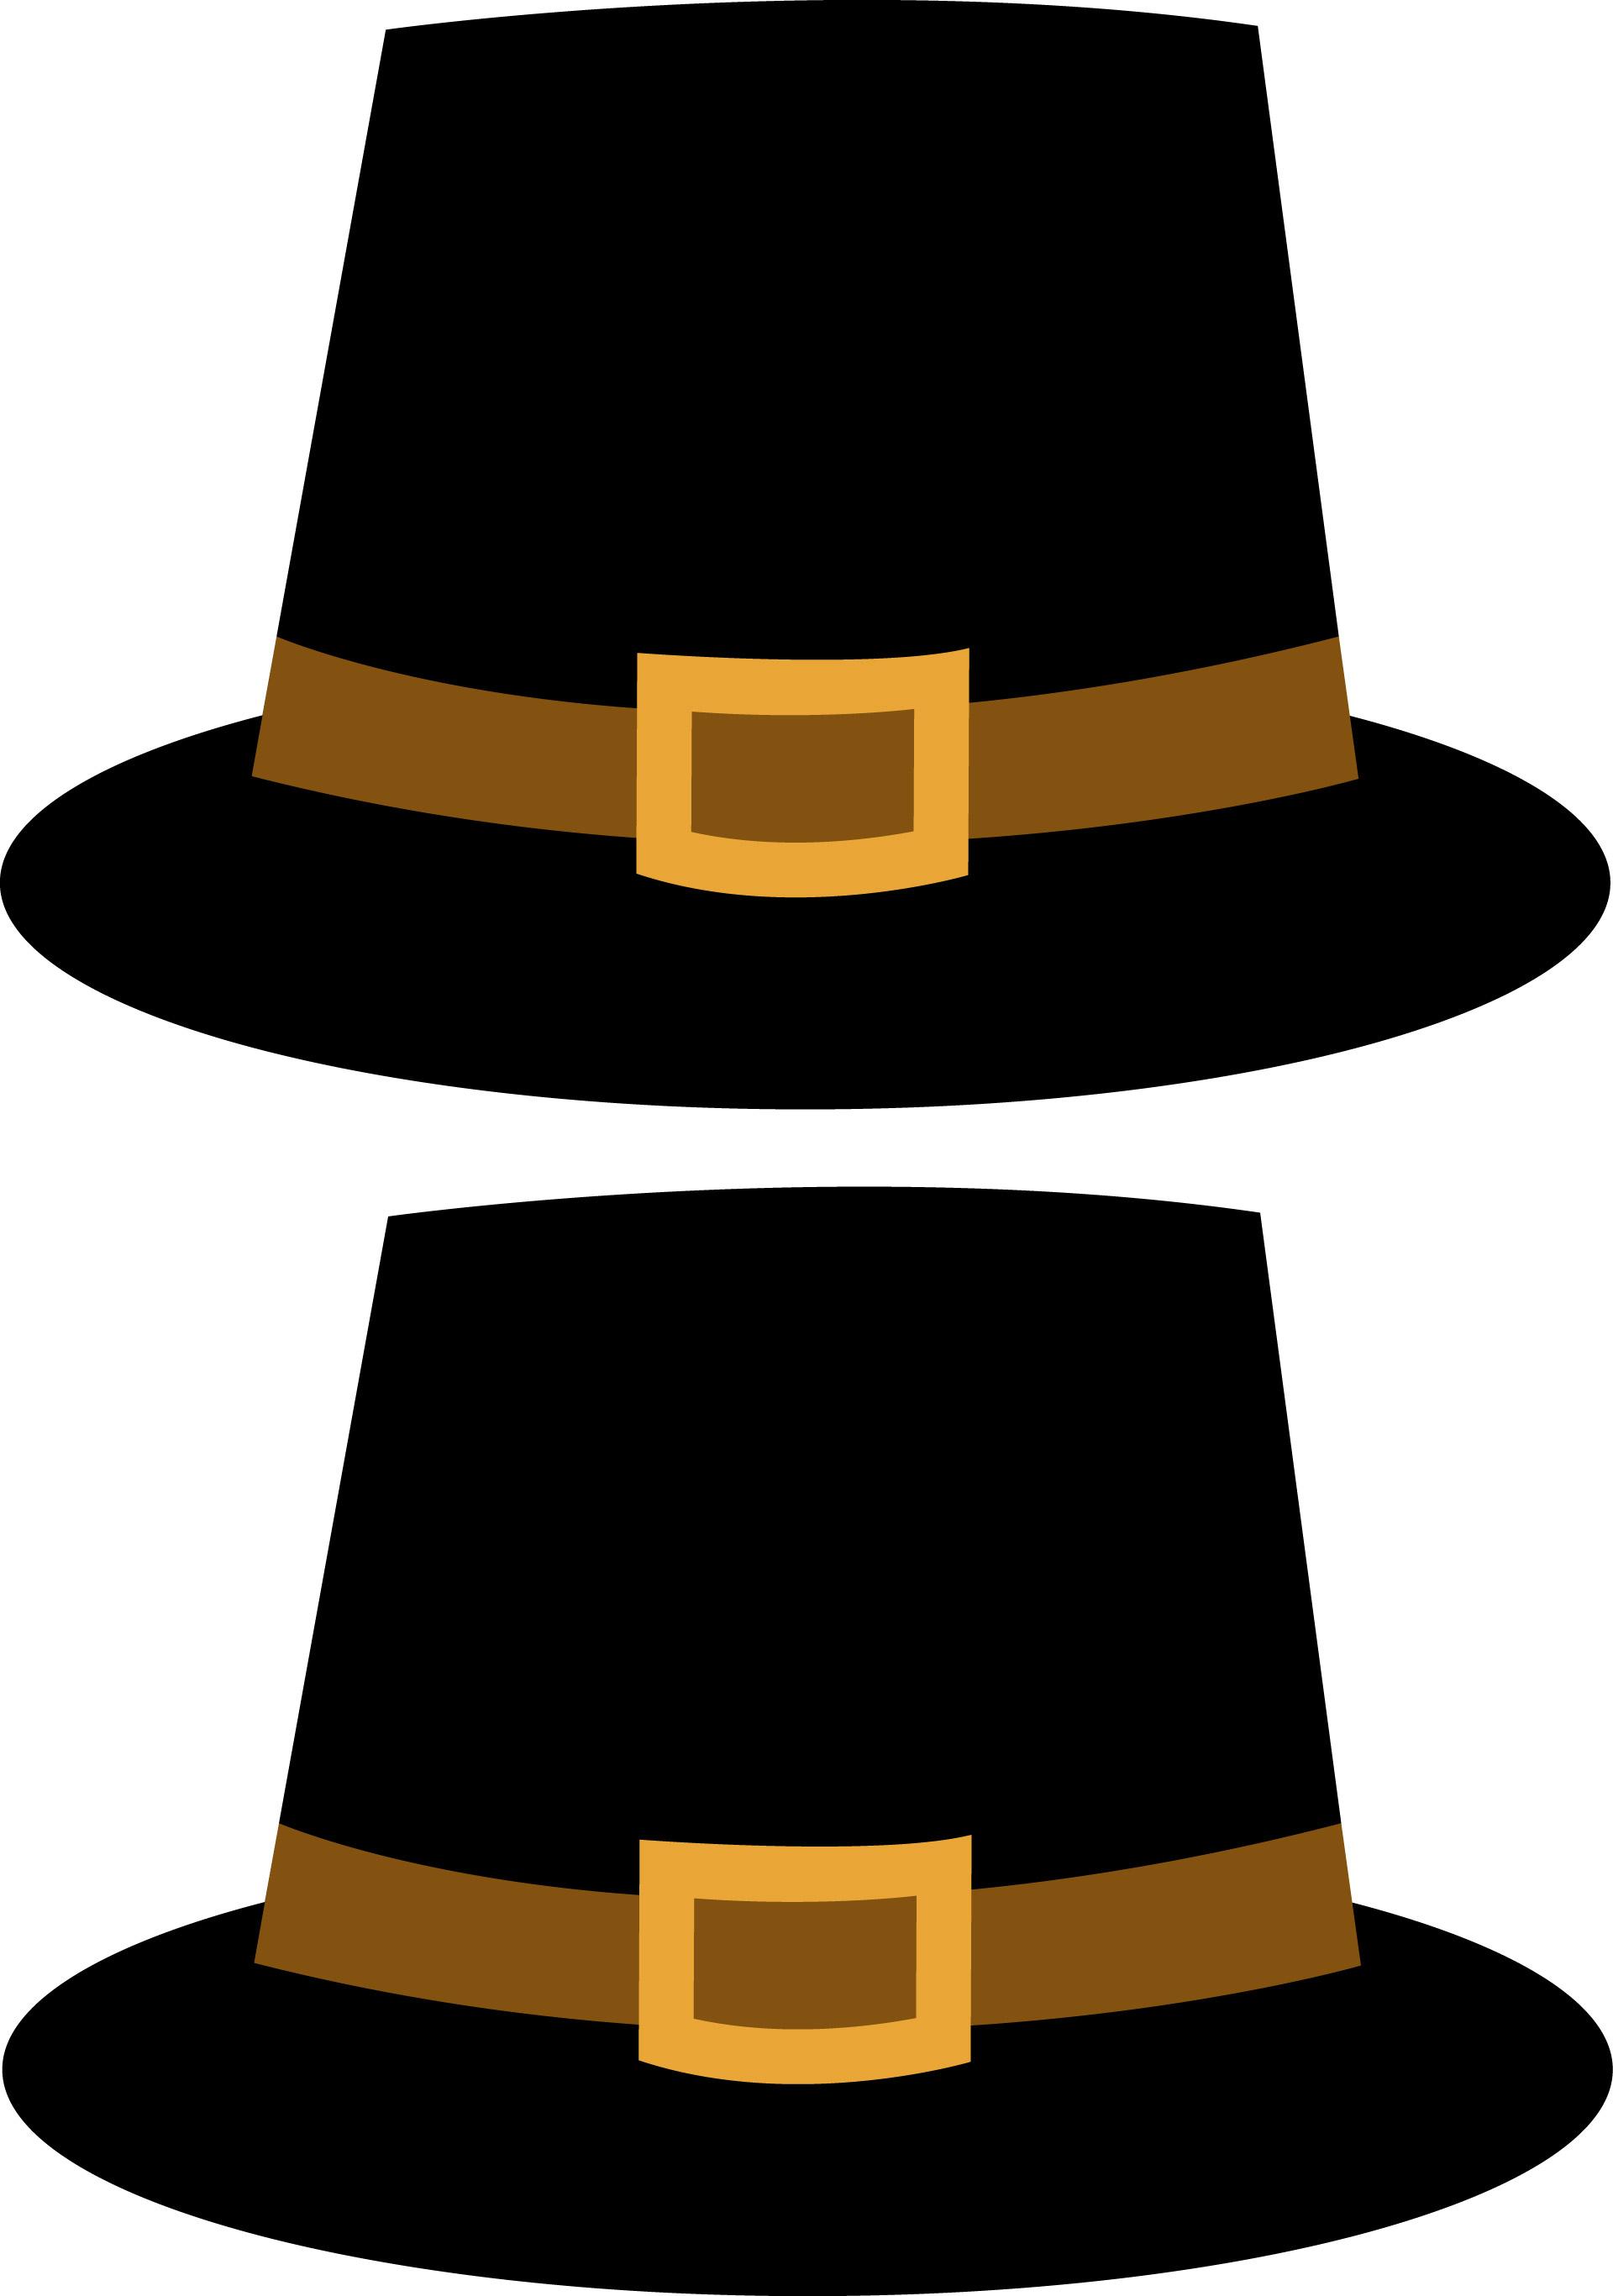 Pilgrims hat clipart png free library Pilgrim hat clipart - Cliparting.com png free library